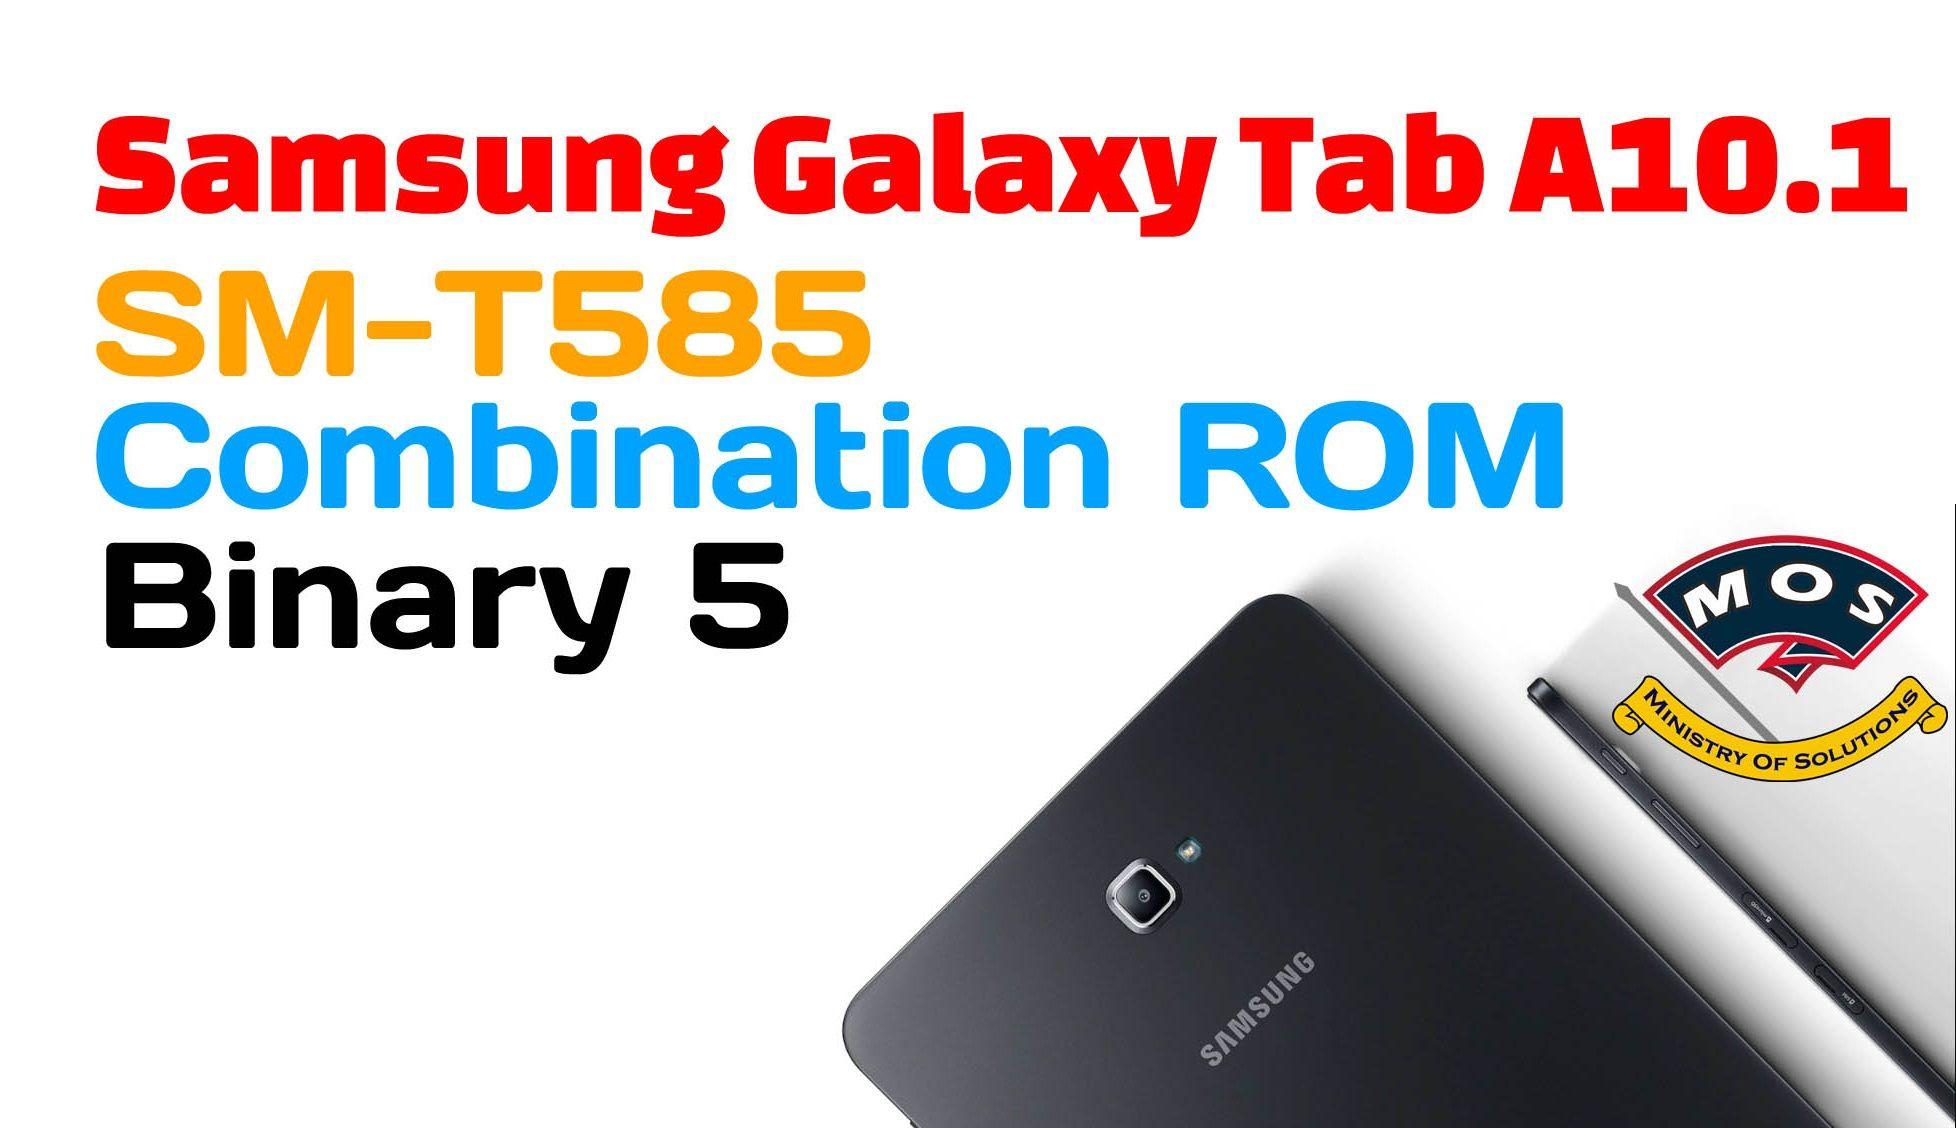 Samsung Galaxy Tab A10 1 Combination File Binary 5 B5 U5 S5 Samsung Galaxy Tab Galaxy Tab Samsung Galaxy